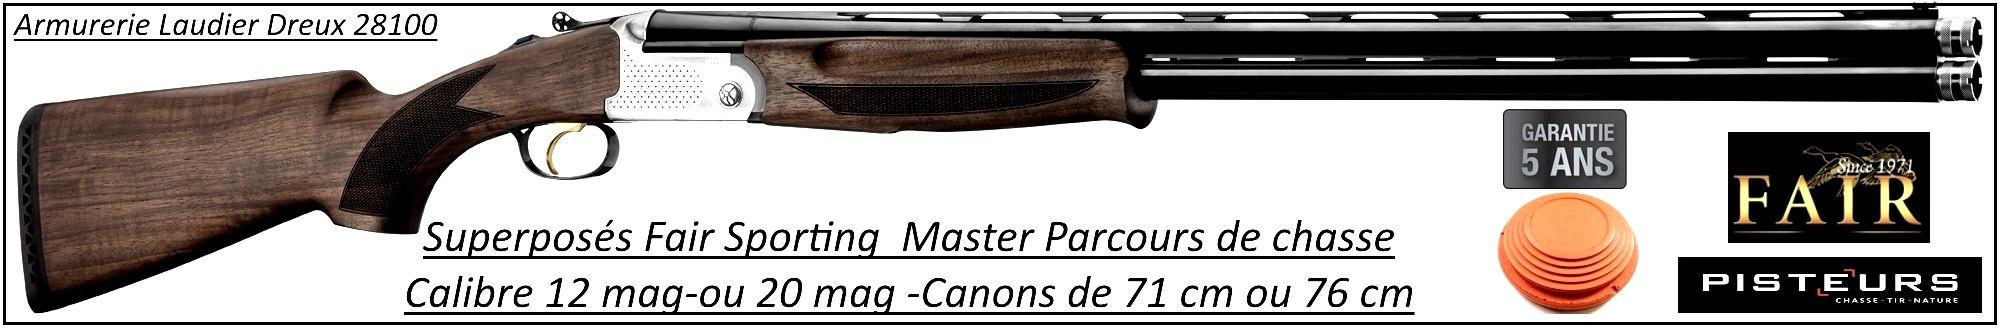 Superposé Fair Sporting Master Calibre 12 mag Canons 76 cm-Promotion-Ref DC450